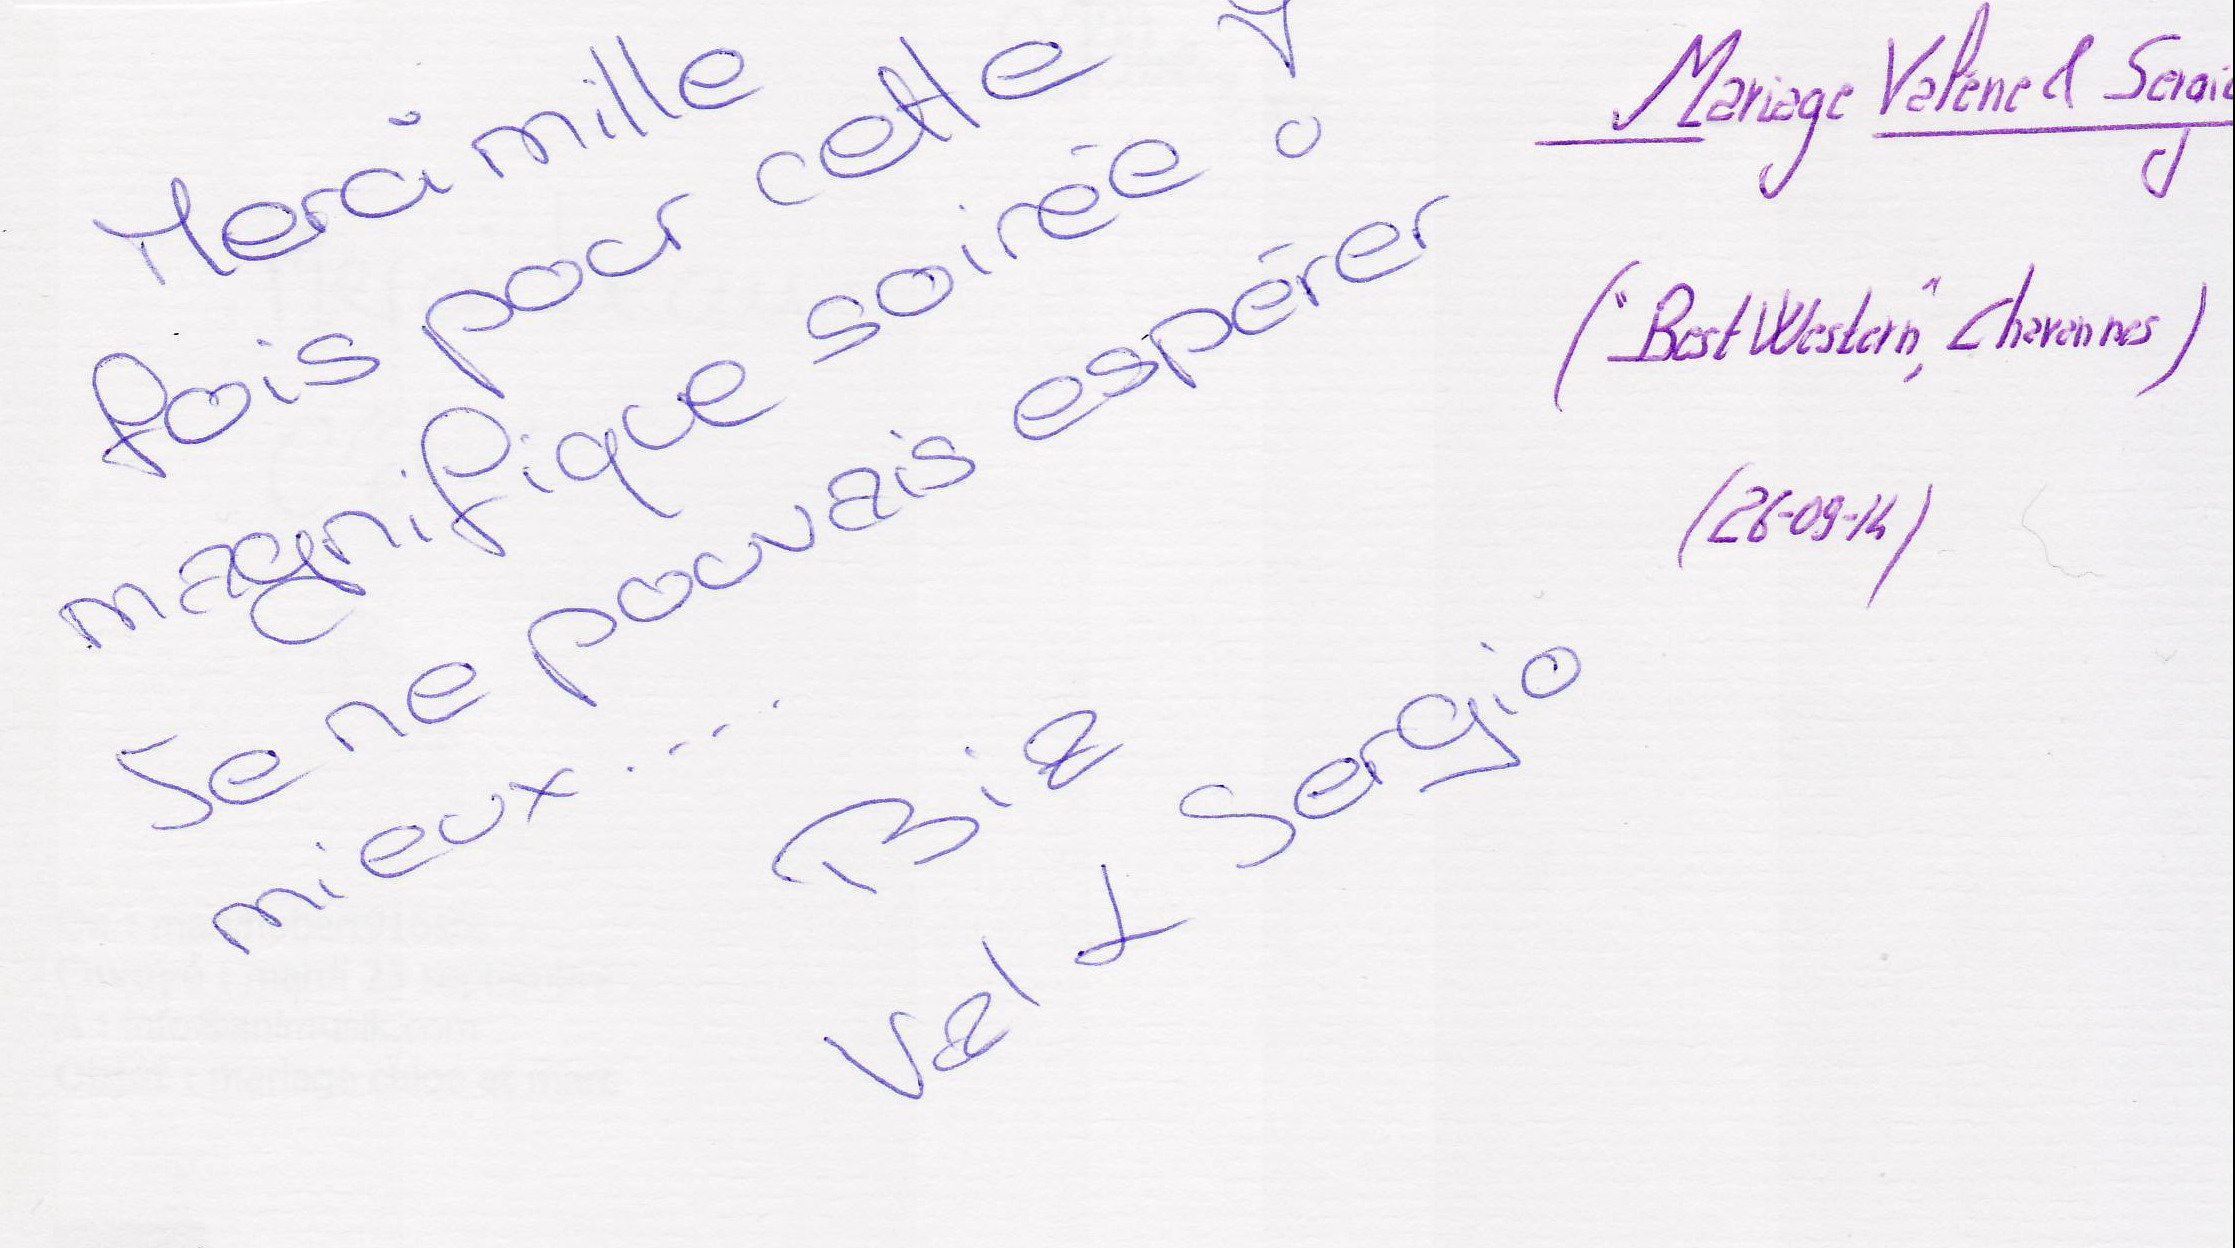 Mariage_LEONI_Sergio_&_ZINZERI_Valérie_(Best_Western_Chavannes_De_Bogis)_(26-09-2014)